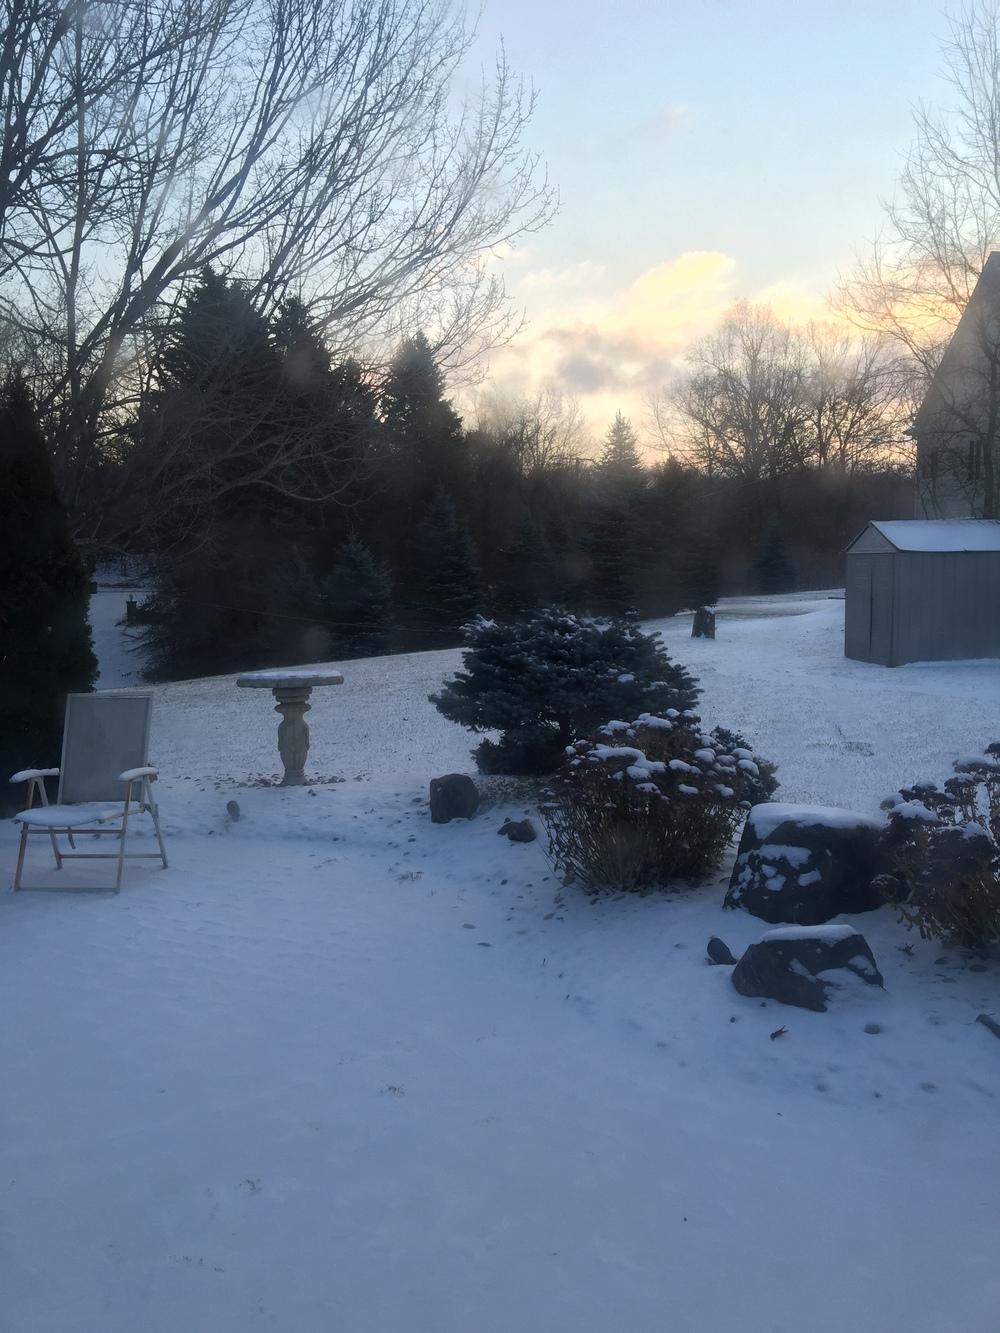 November snow delays fall cleanups, ugh!